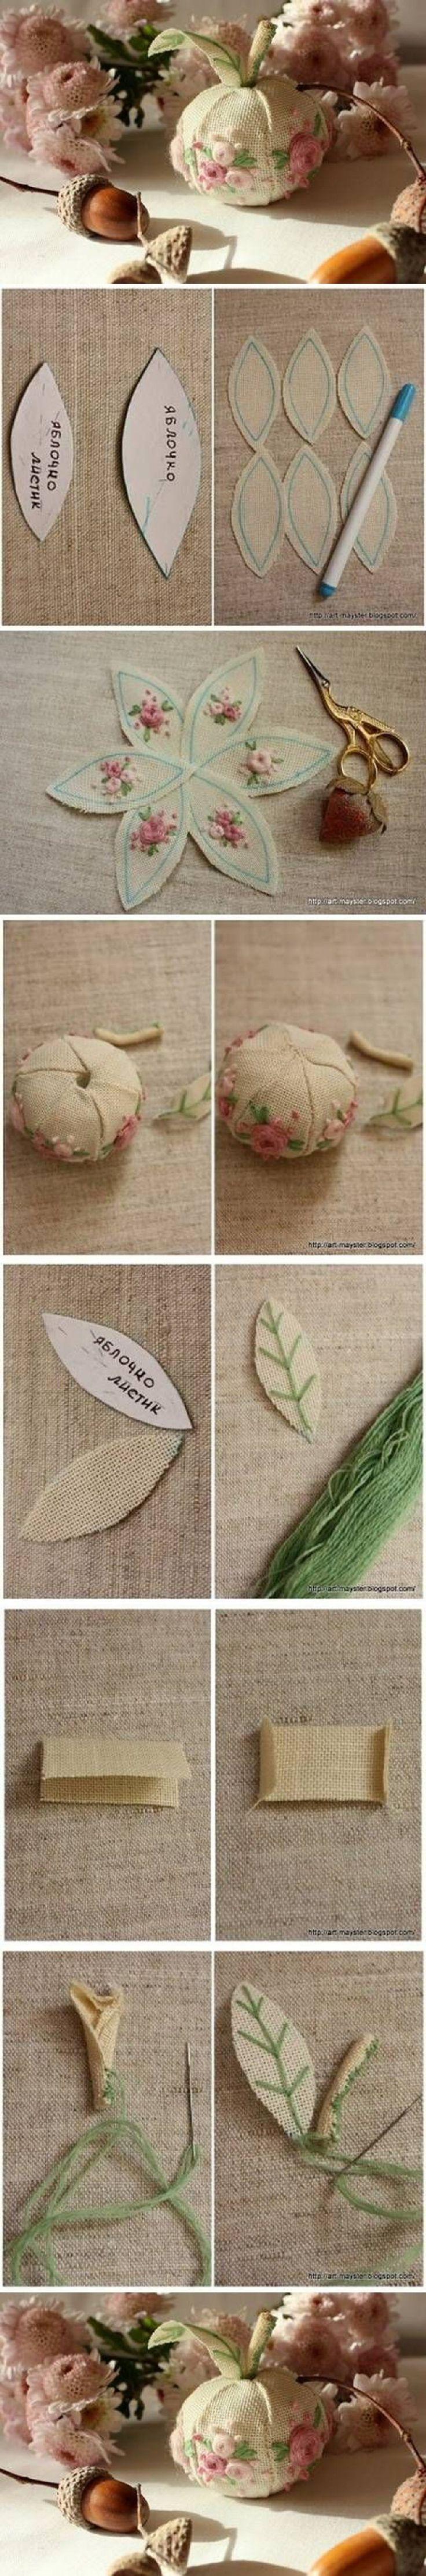 "I ❤ pincushions . . . DIY Fabric Apple Decor- ""looks like one to me"""